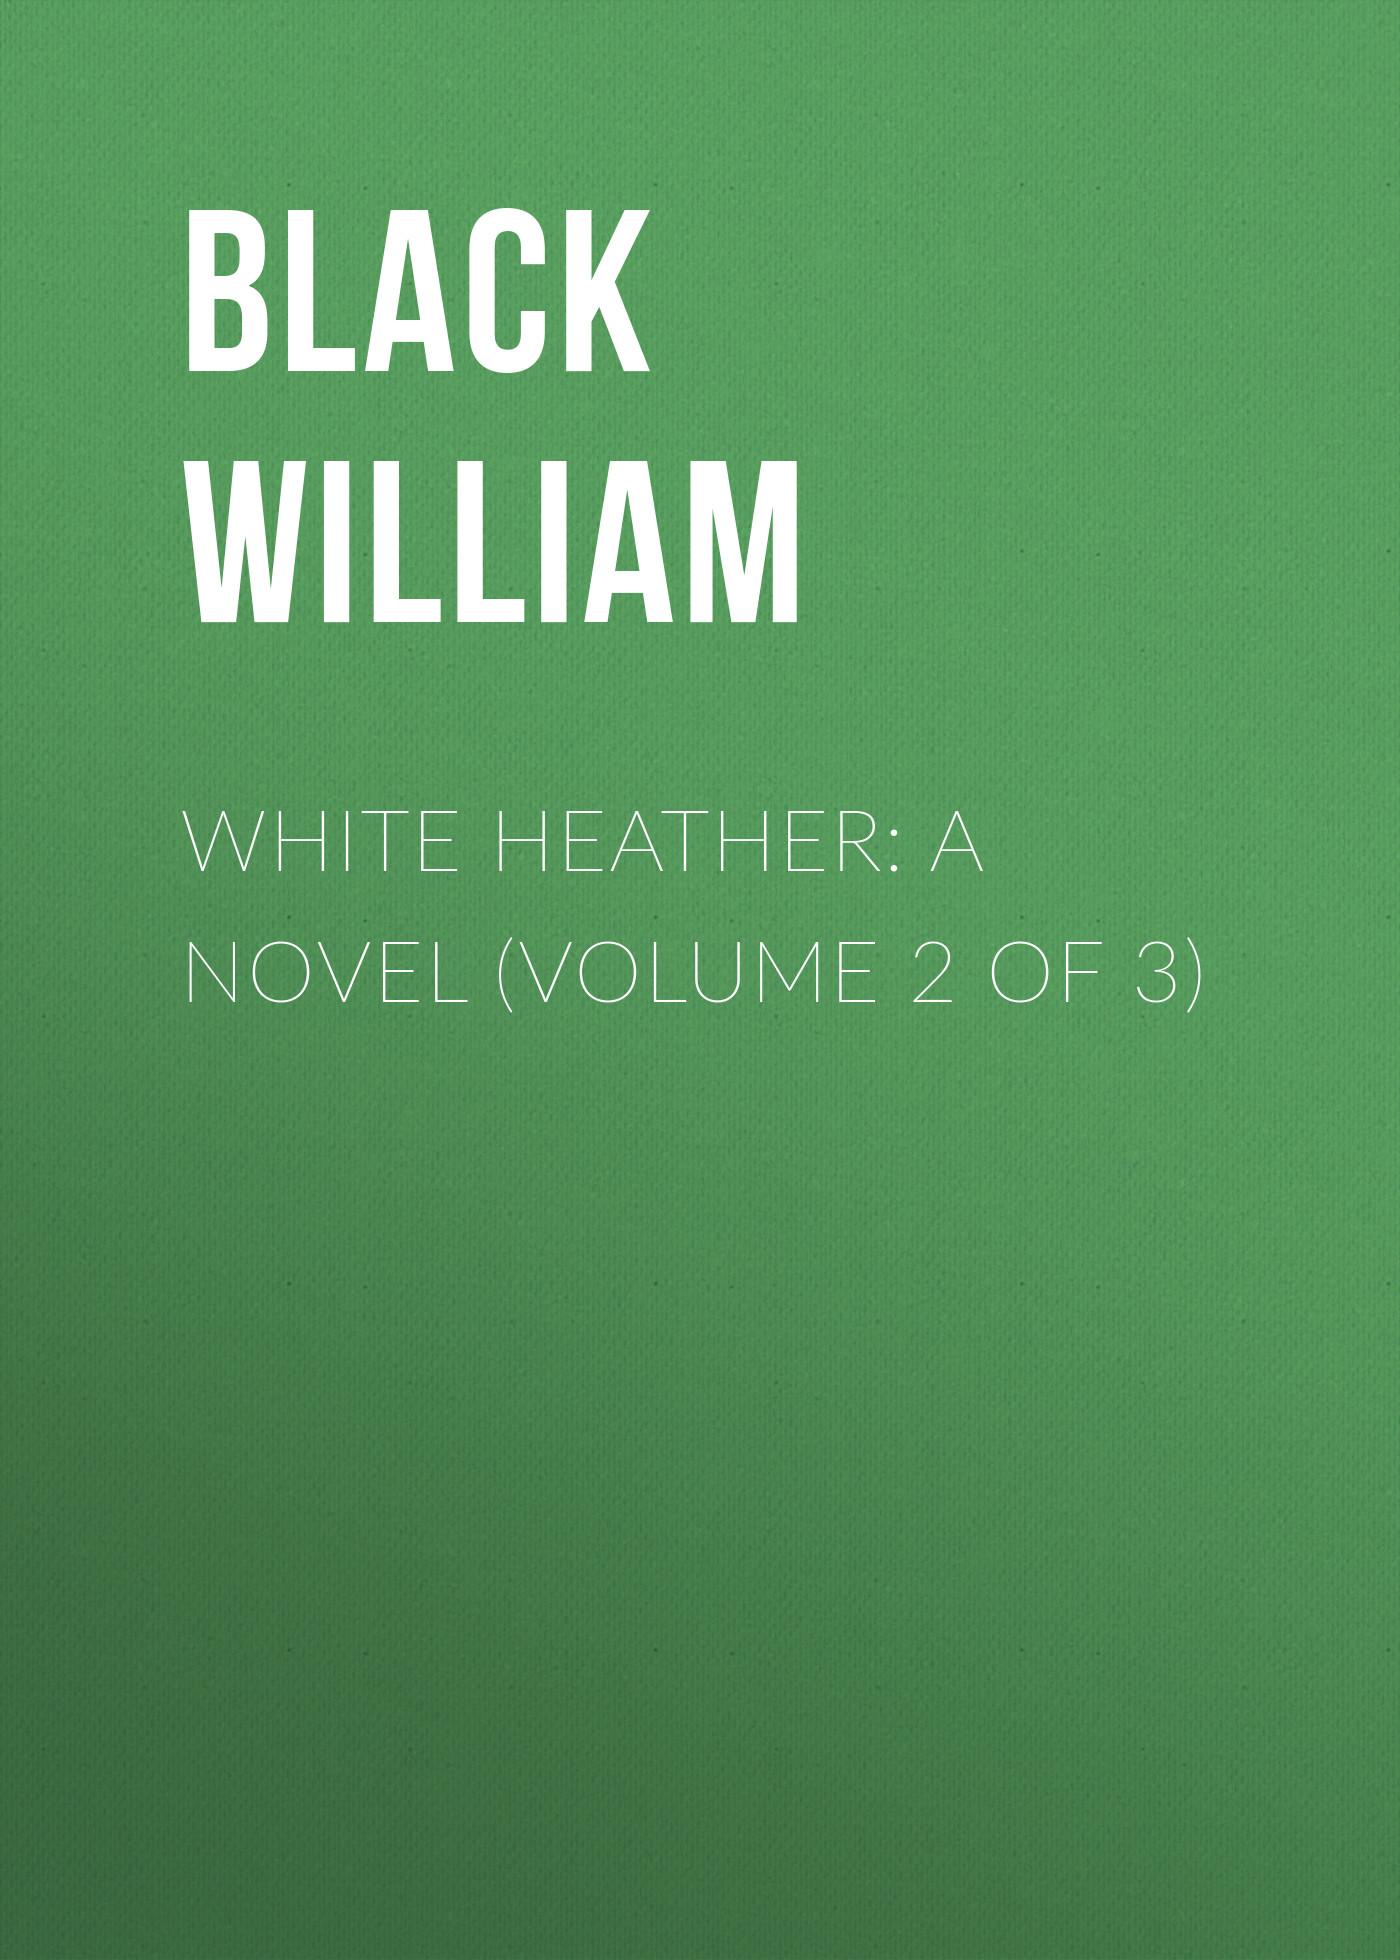 White Heather: A Novel (Volume 2 of 3)